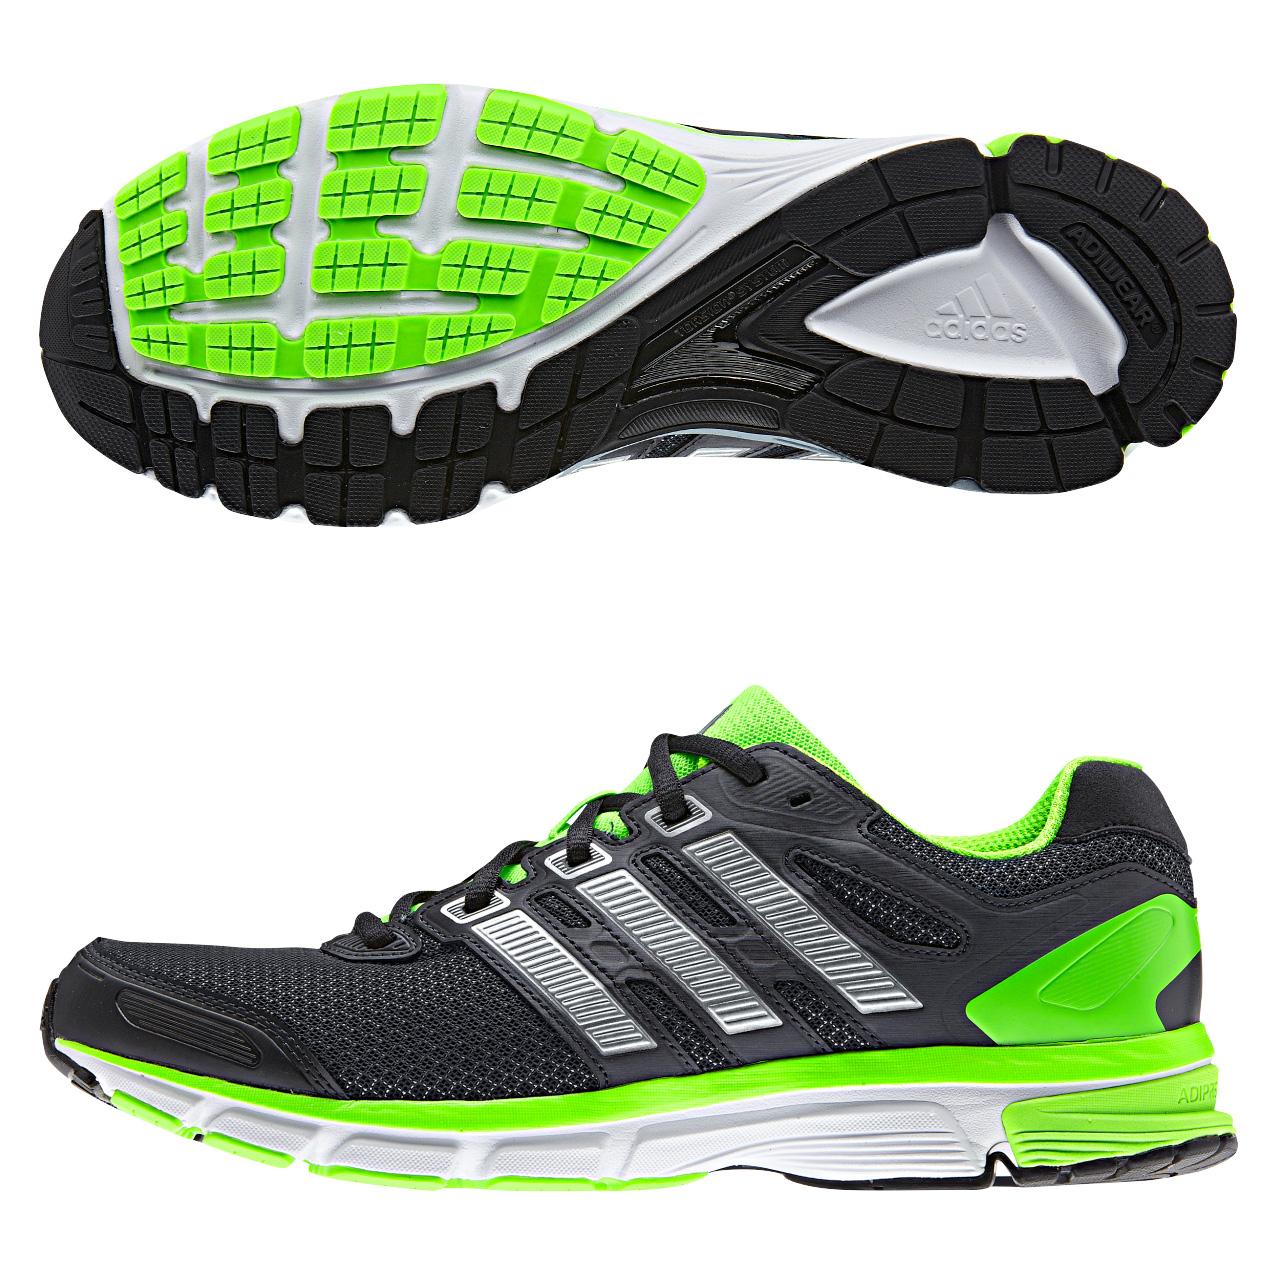 Adidas Nova Stability Trainers Dk Grey